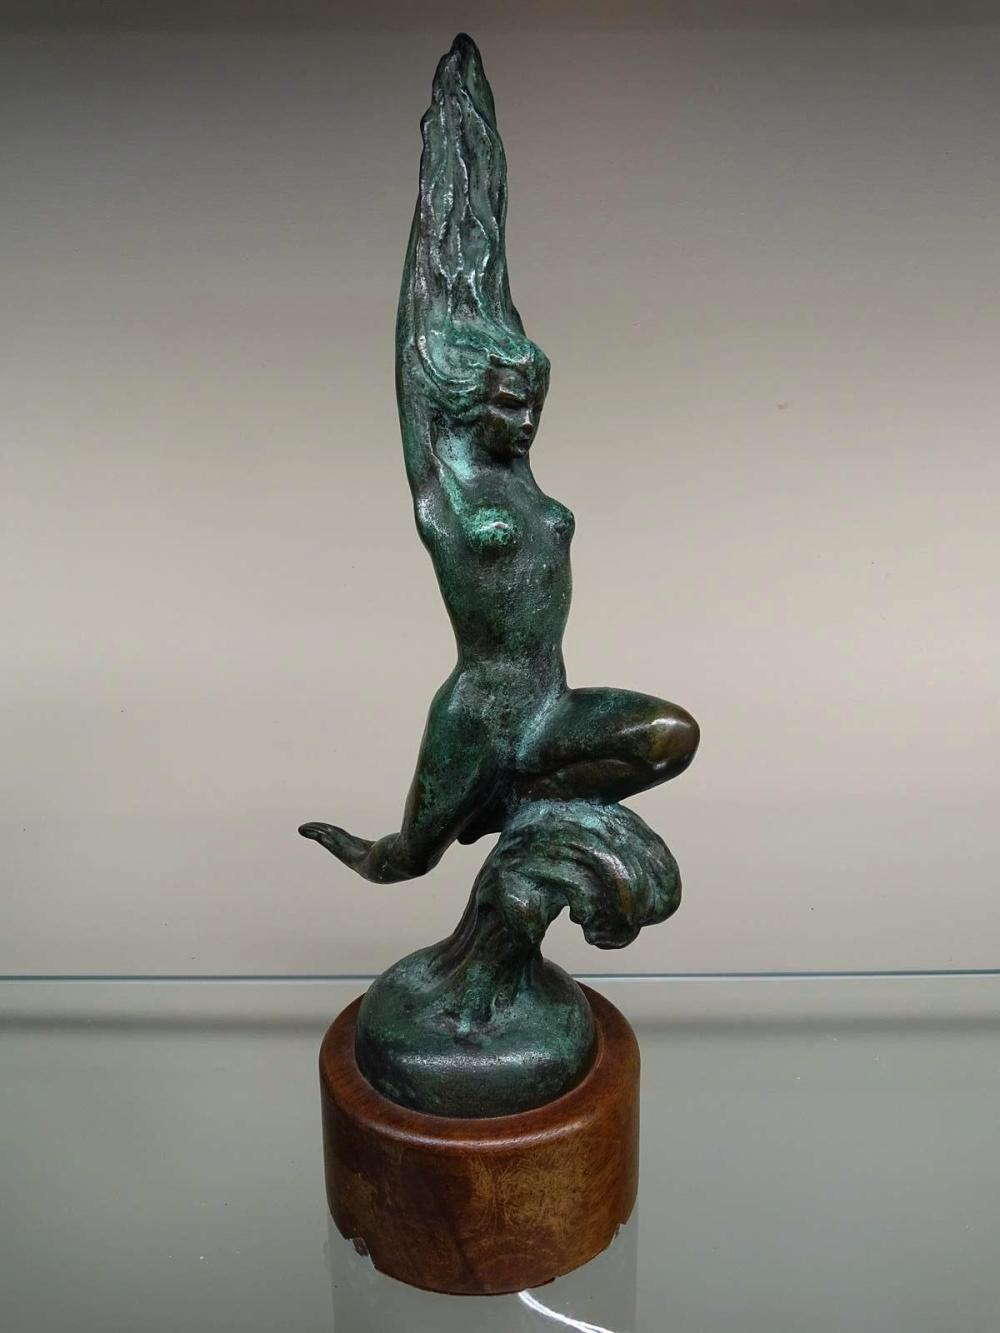 ART DECO FEMALE NUDE WOMAN